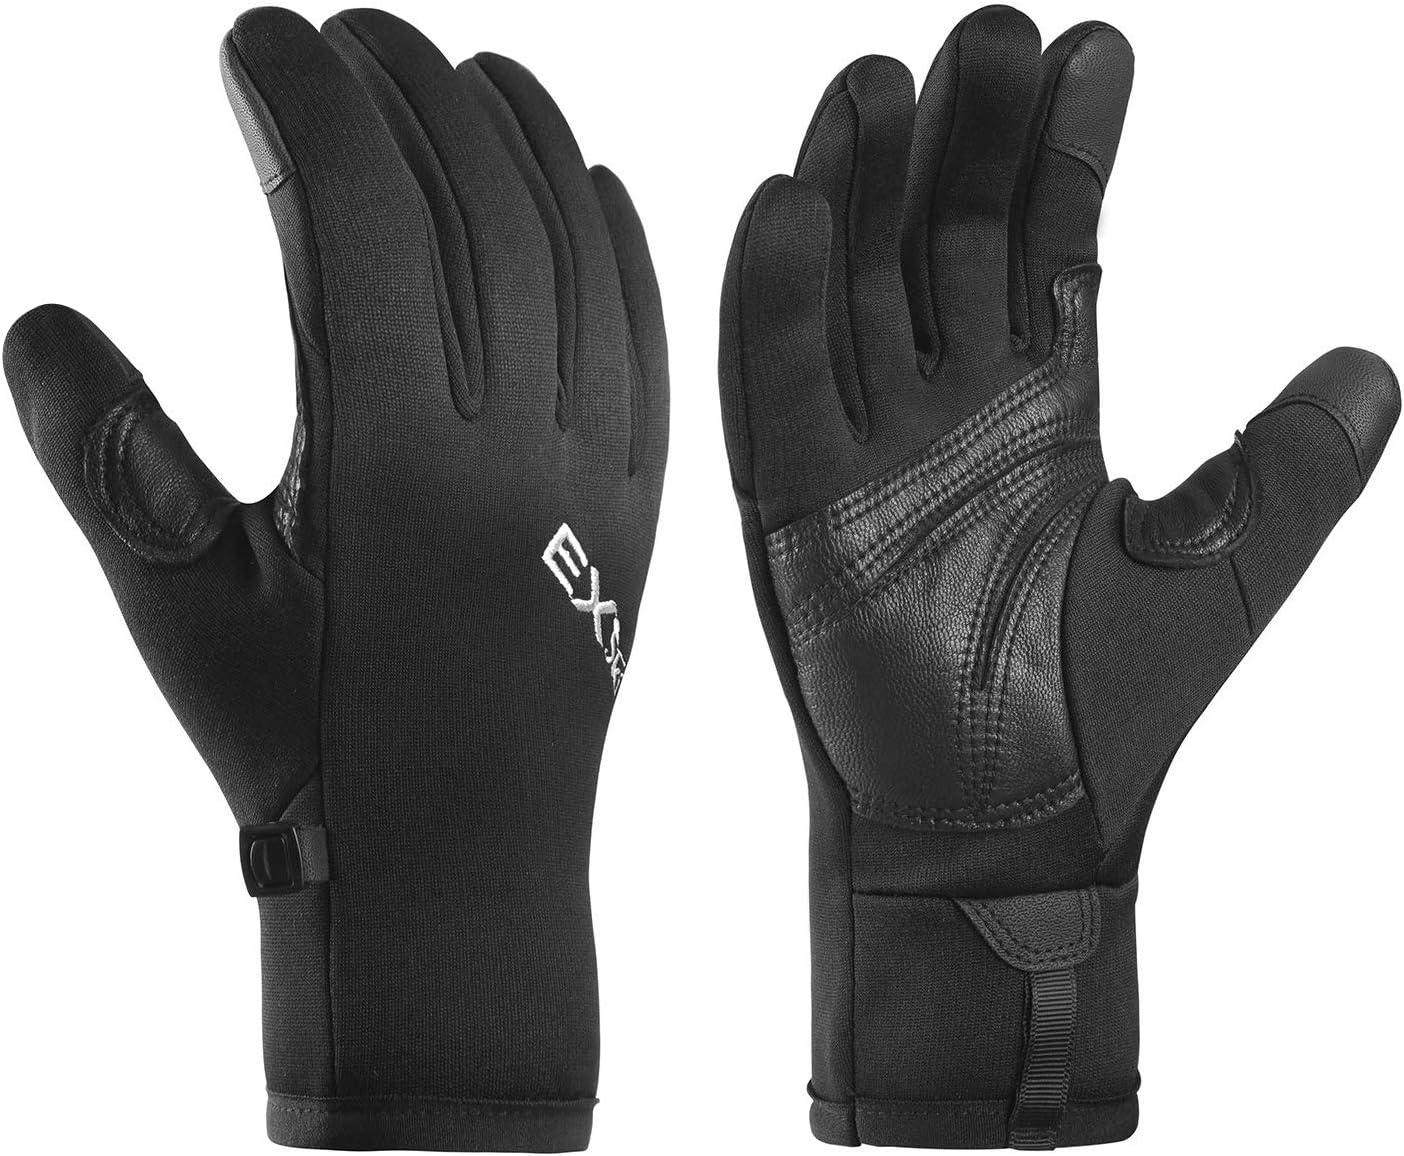 5100 Ski Gloves Sports Gloves Waterproof Non Slip Durable Riding Glove